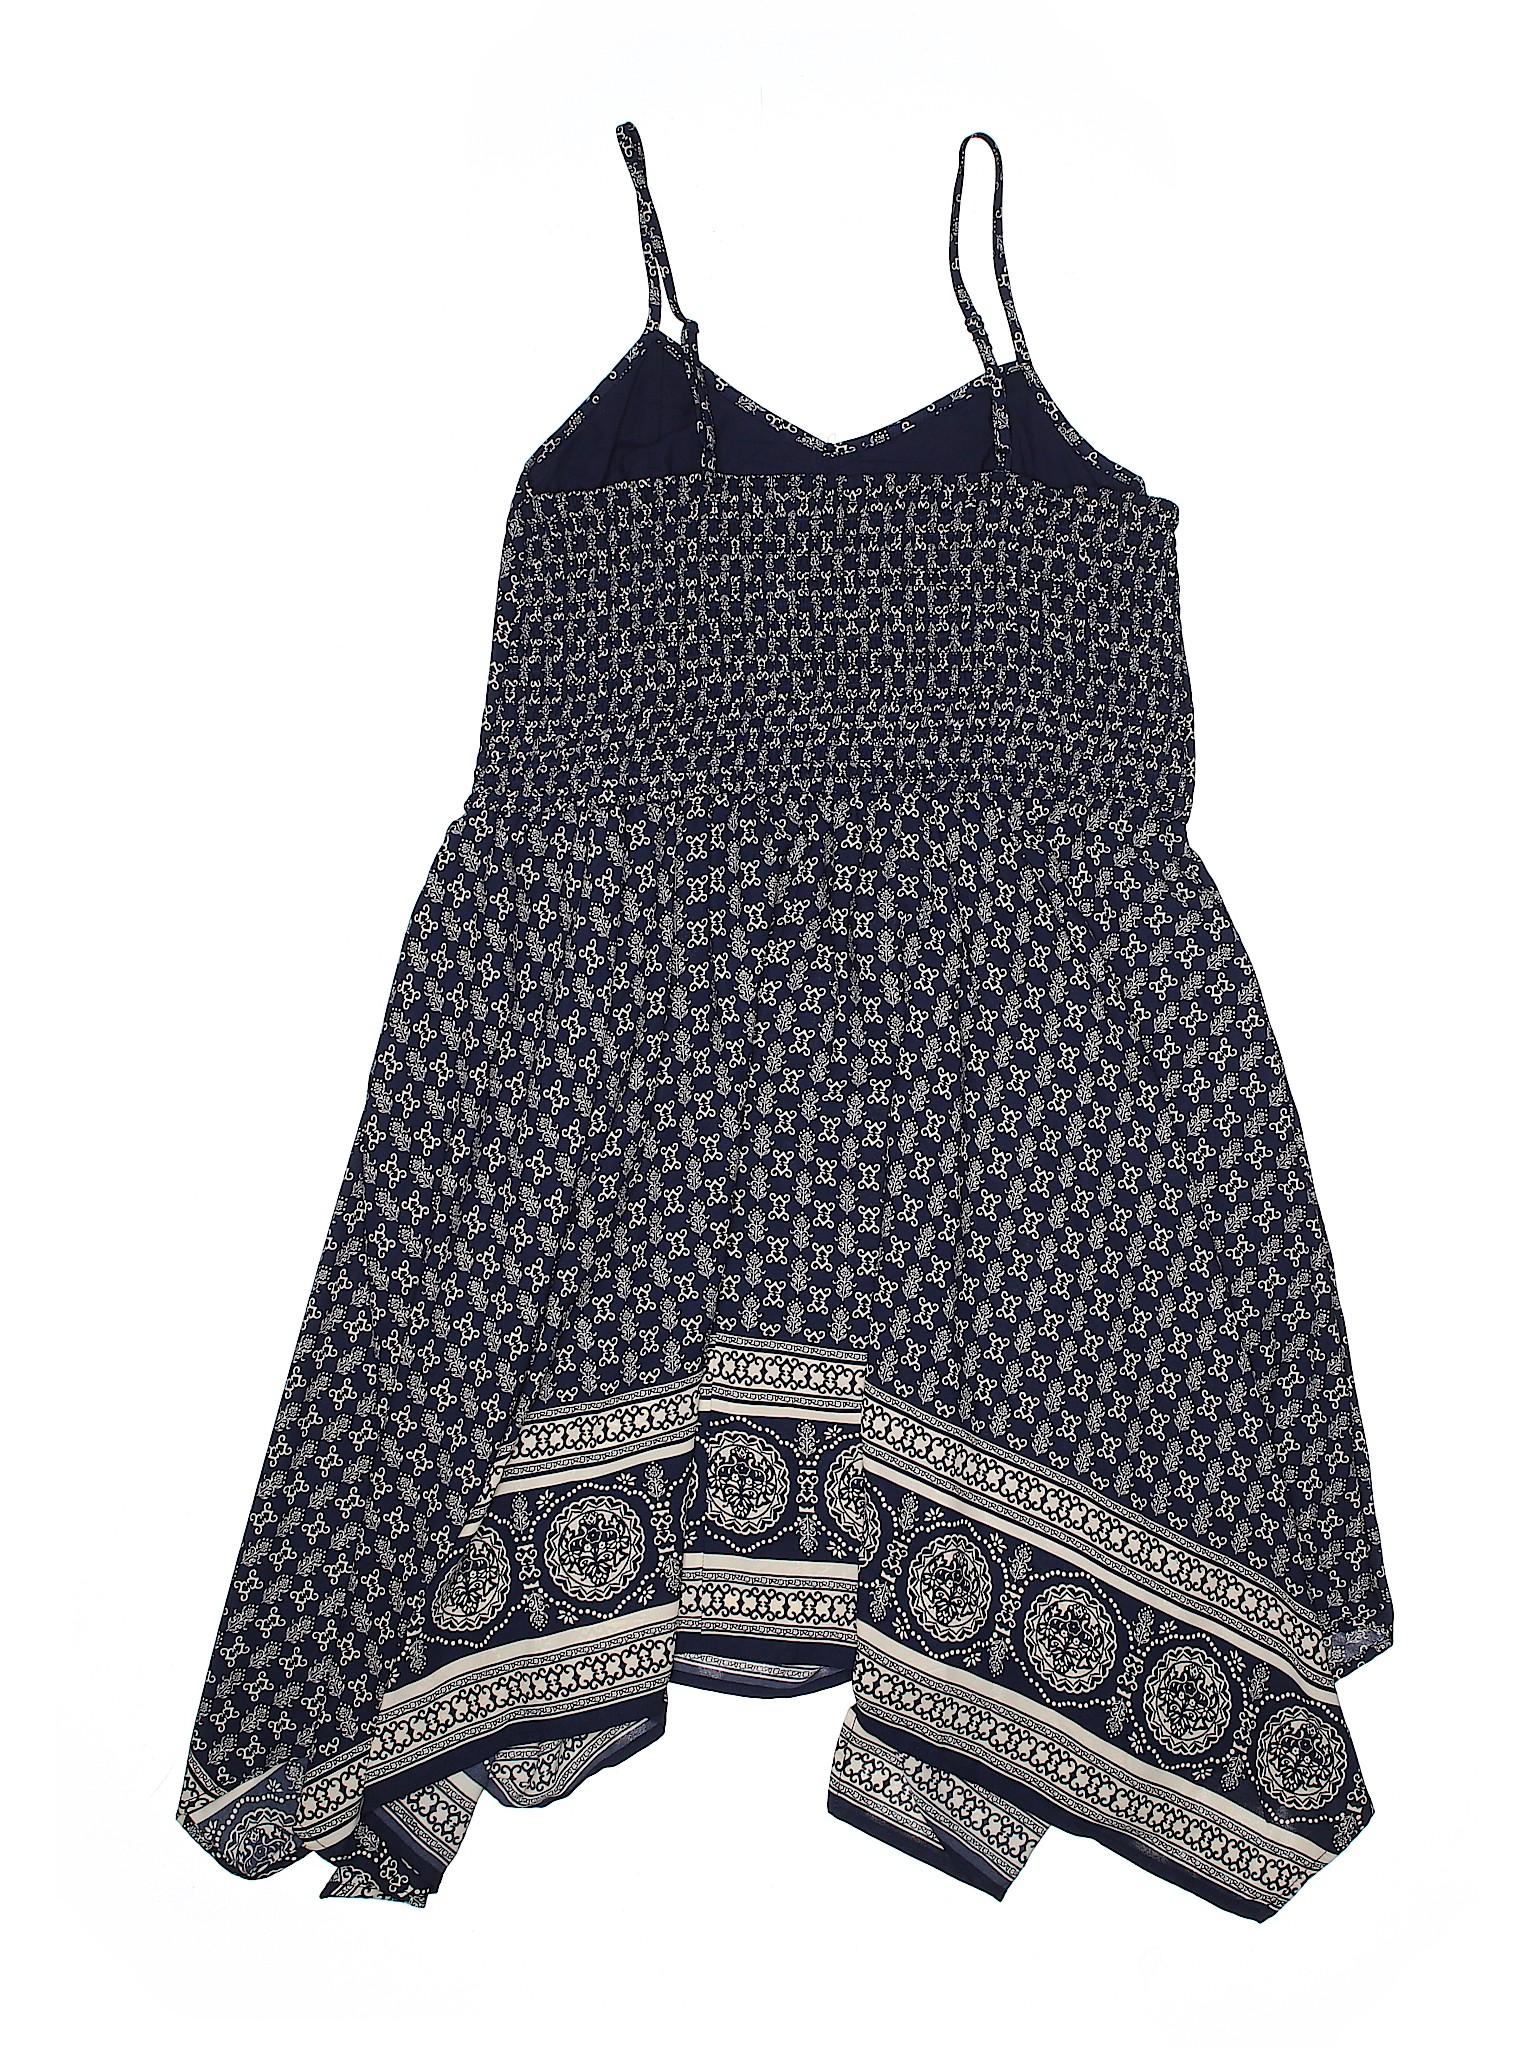 Xhilaration Boutique Boutique Casual Dress winter winter pa011wqnt